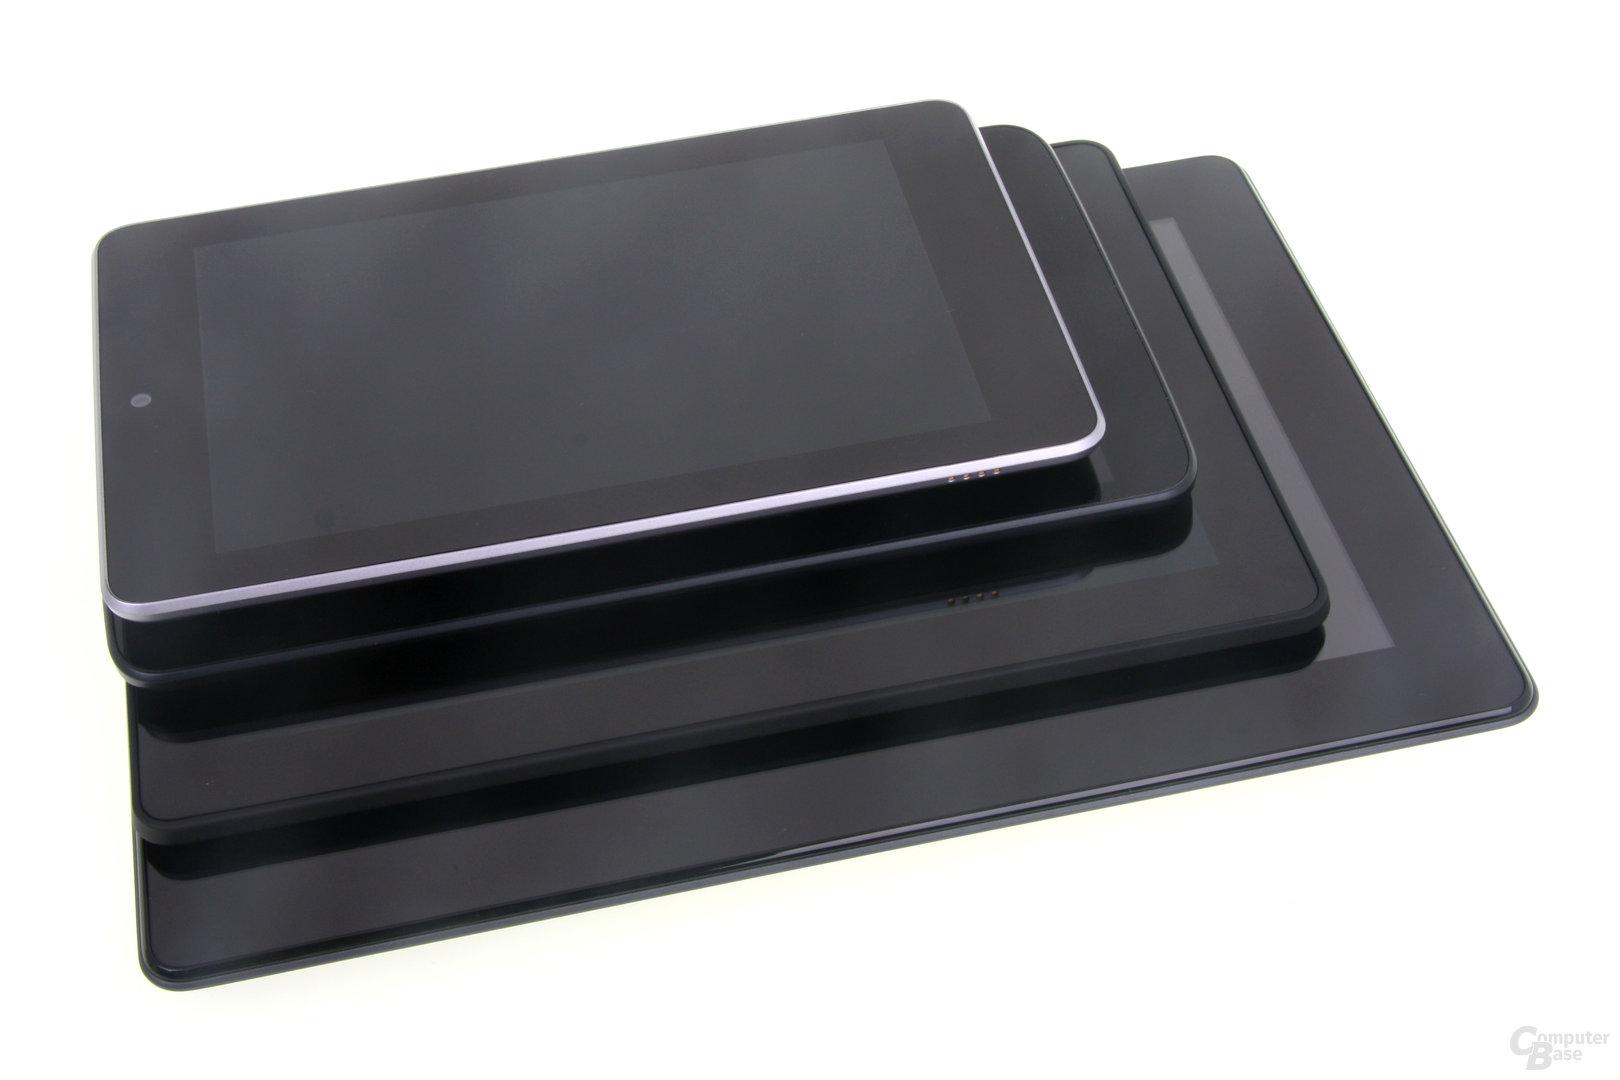 Größenvergleich: Padfone, Kindle Fire HDX 8.9, G Pad 8.3, Nexus 7